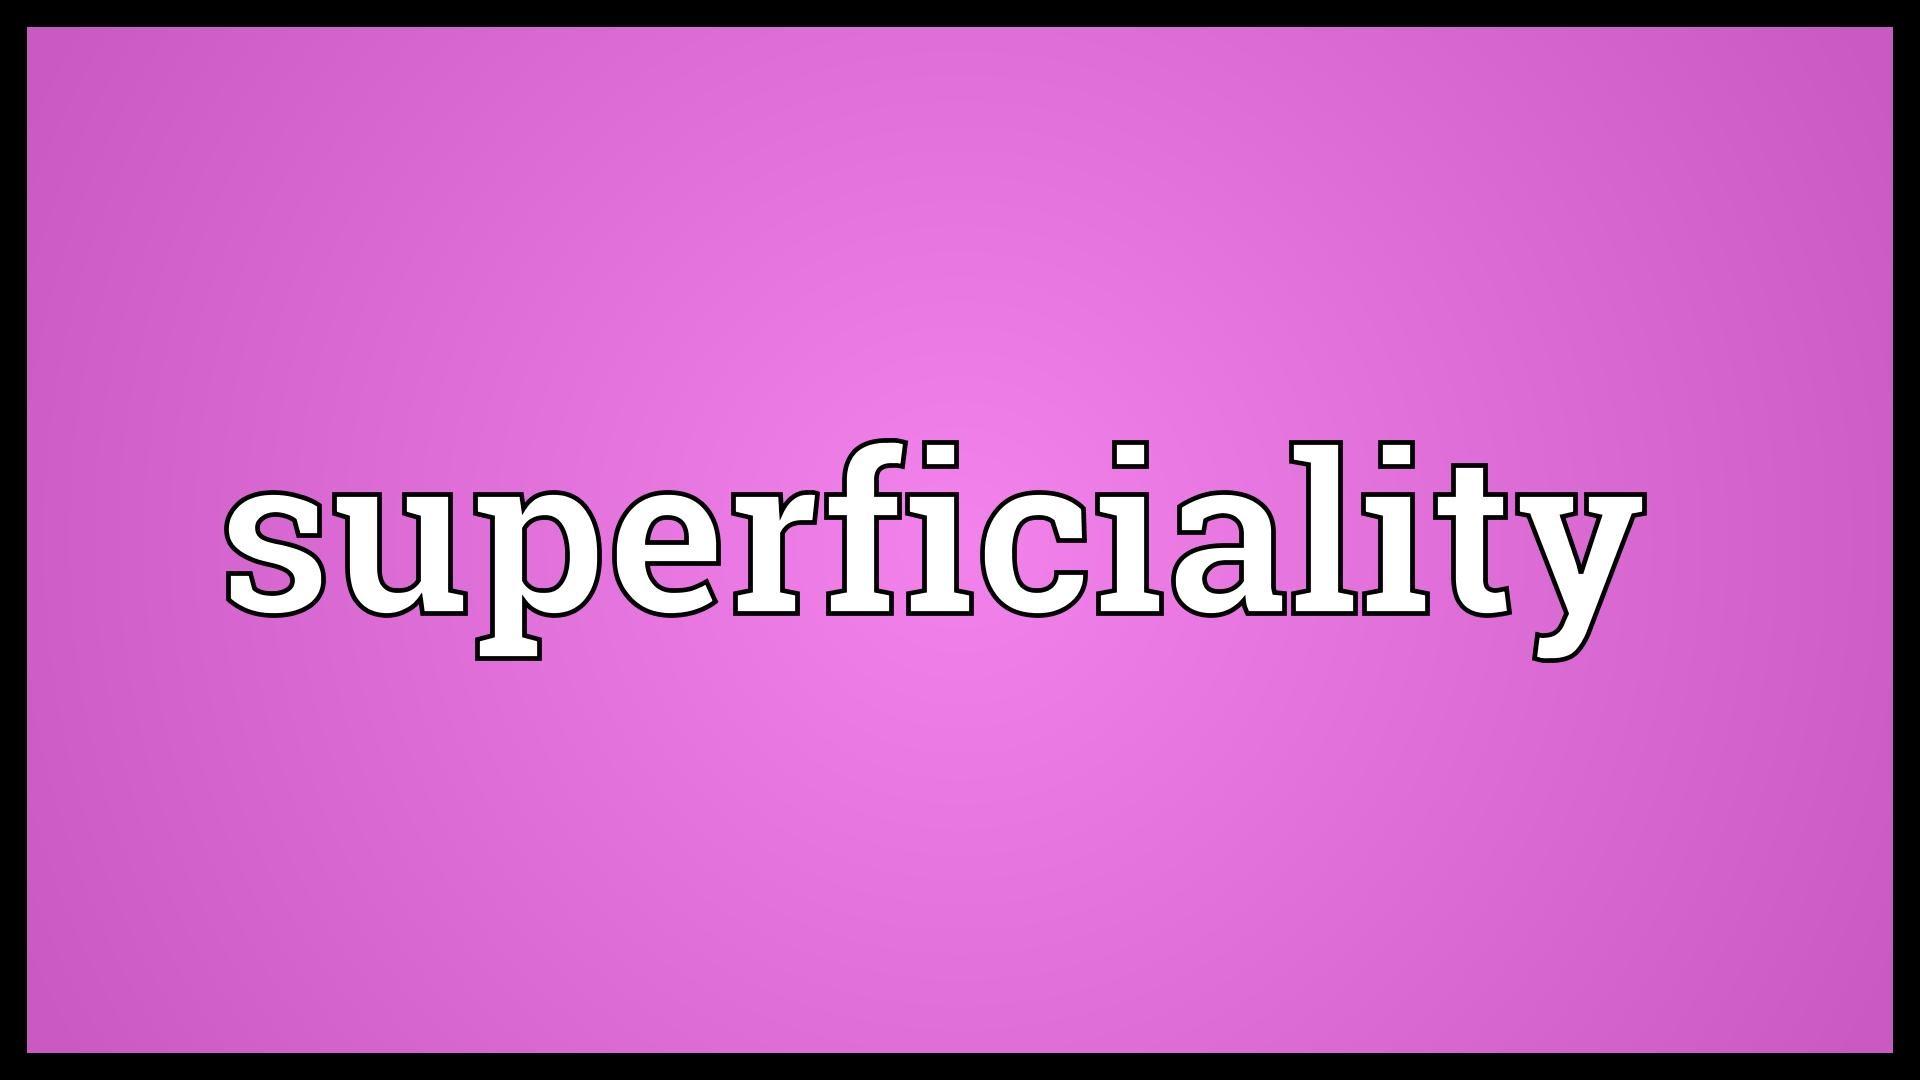 Superficiality